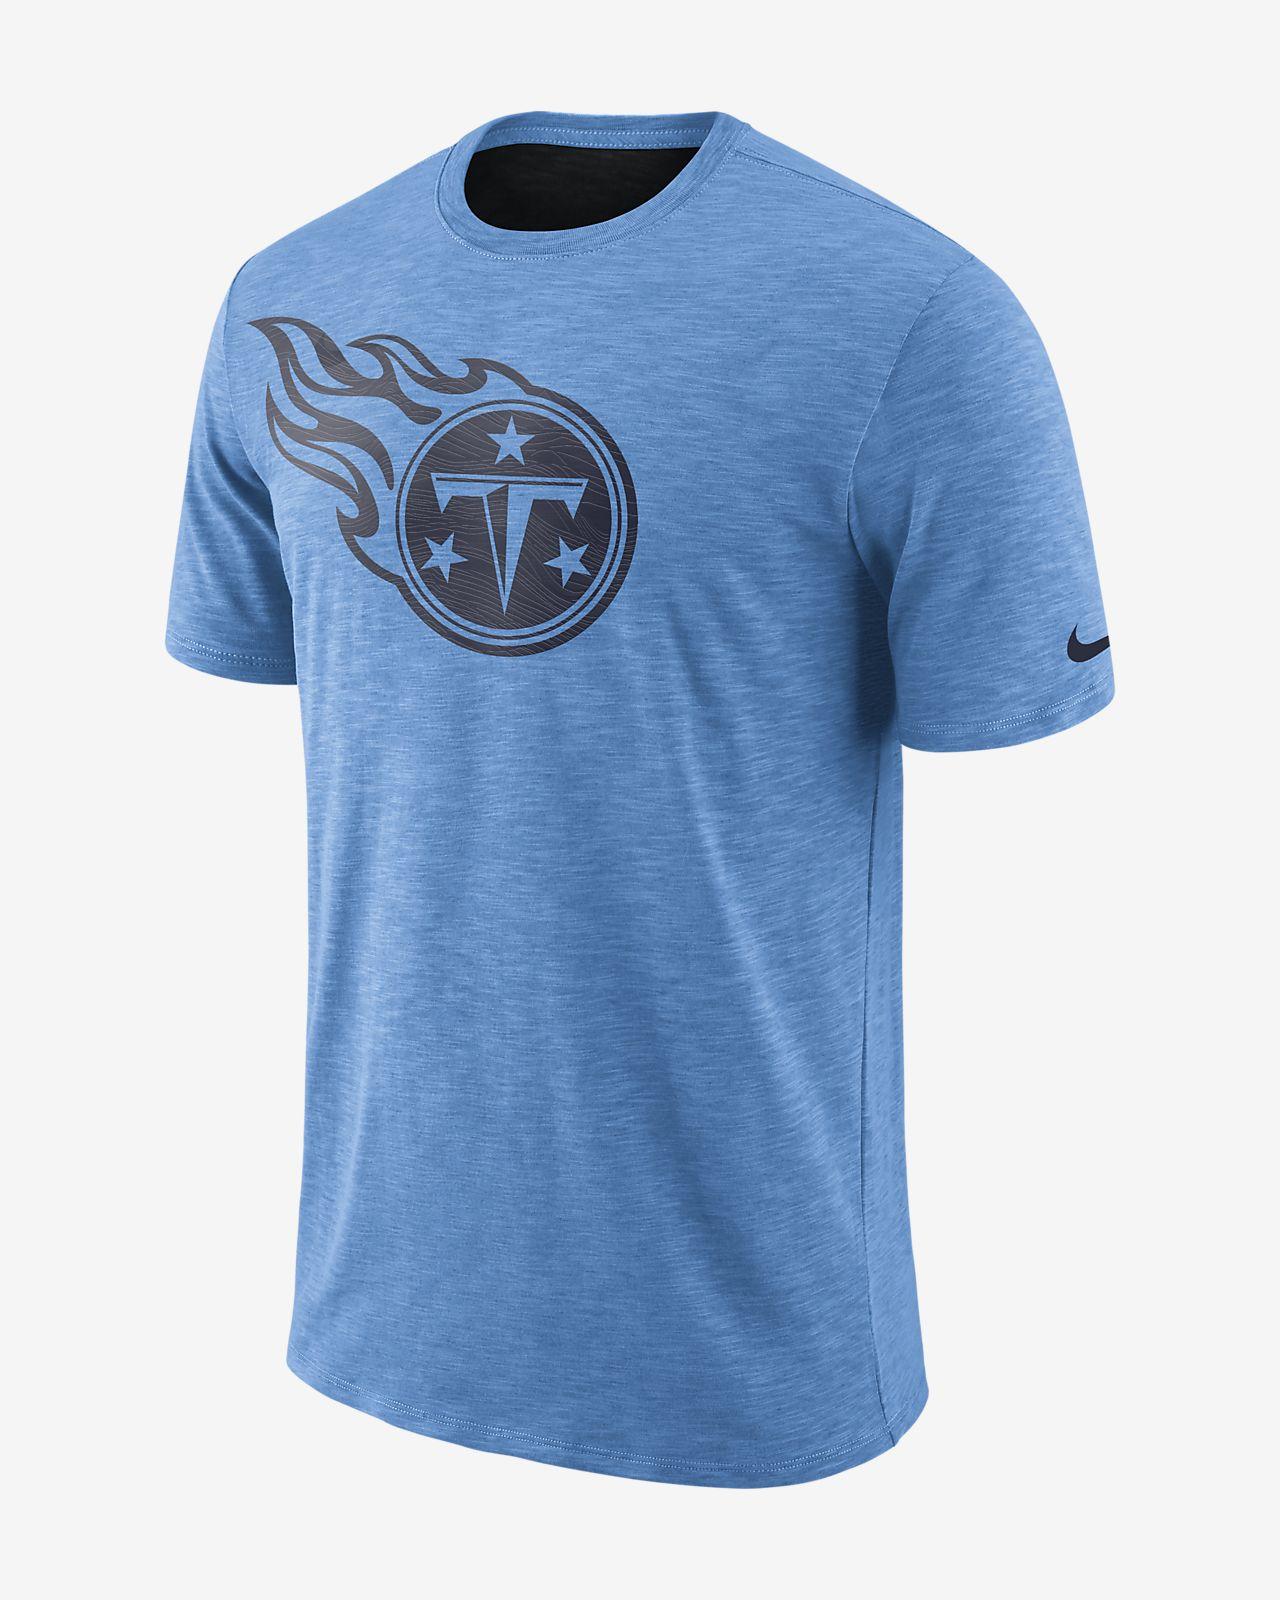 Fit nfl Camiseta On Dri Es Nike Titans Legend Field Hombre 4ZA5nqg